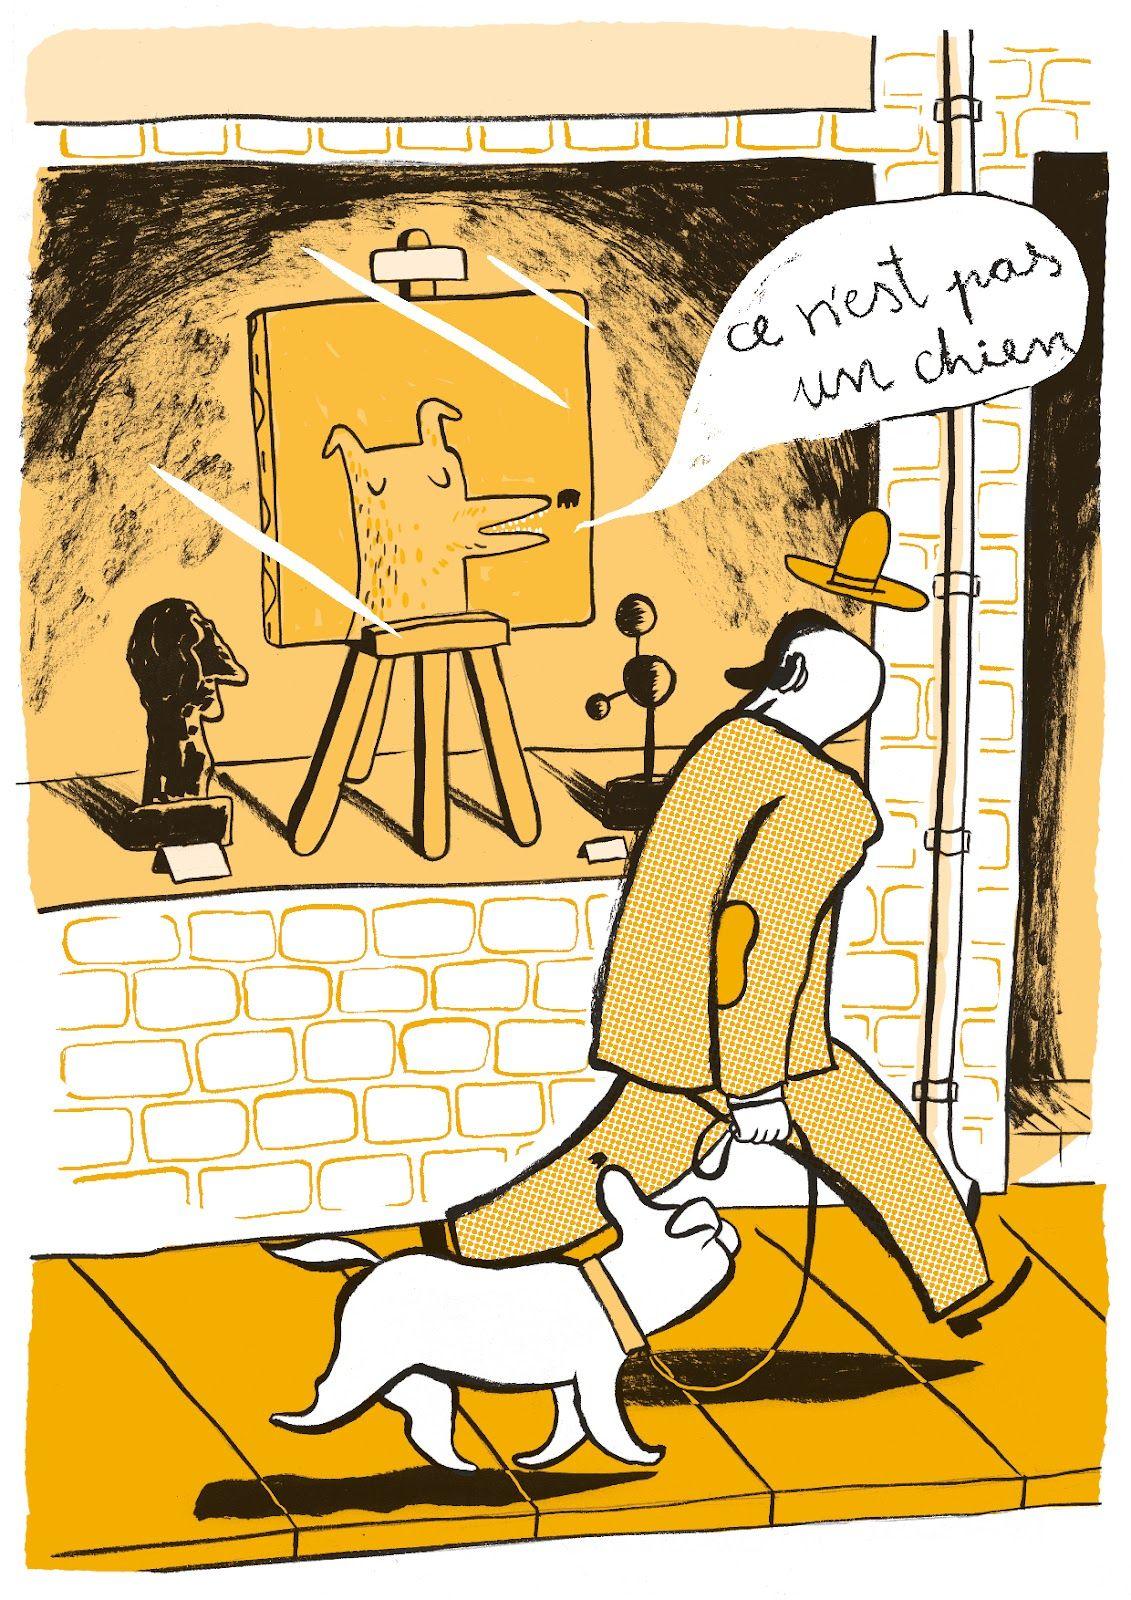 """Ce n'est pas un chien""    ""Si yo pinto mi perro exactamente como es, naturalmente tendré dos perros, pero no una obra de arte."" J. W. Goethe.    ""If I paint my dog exactly as it is, naturally I'll have two dogs, but not a work of art."" J. W. Goethe.    www.pauvalls.net"